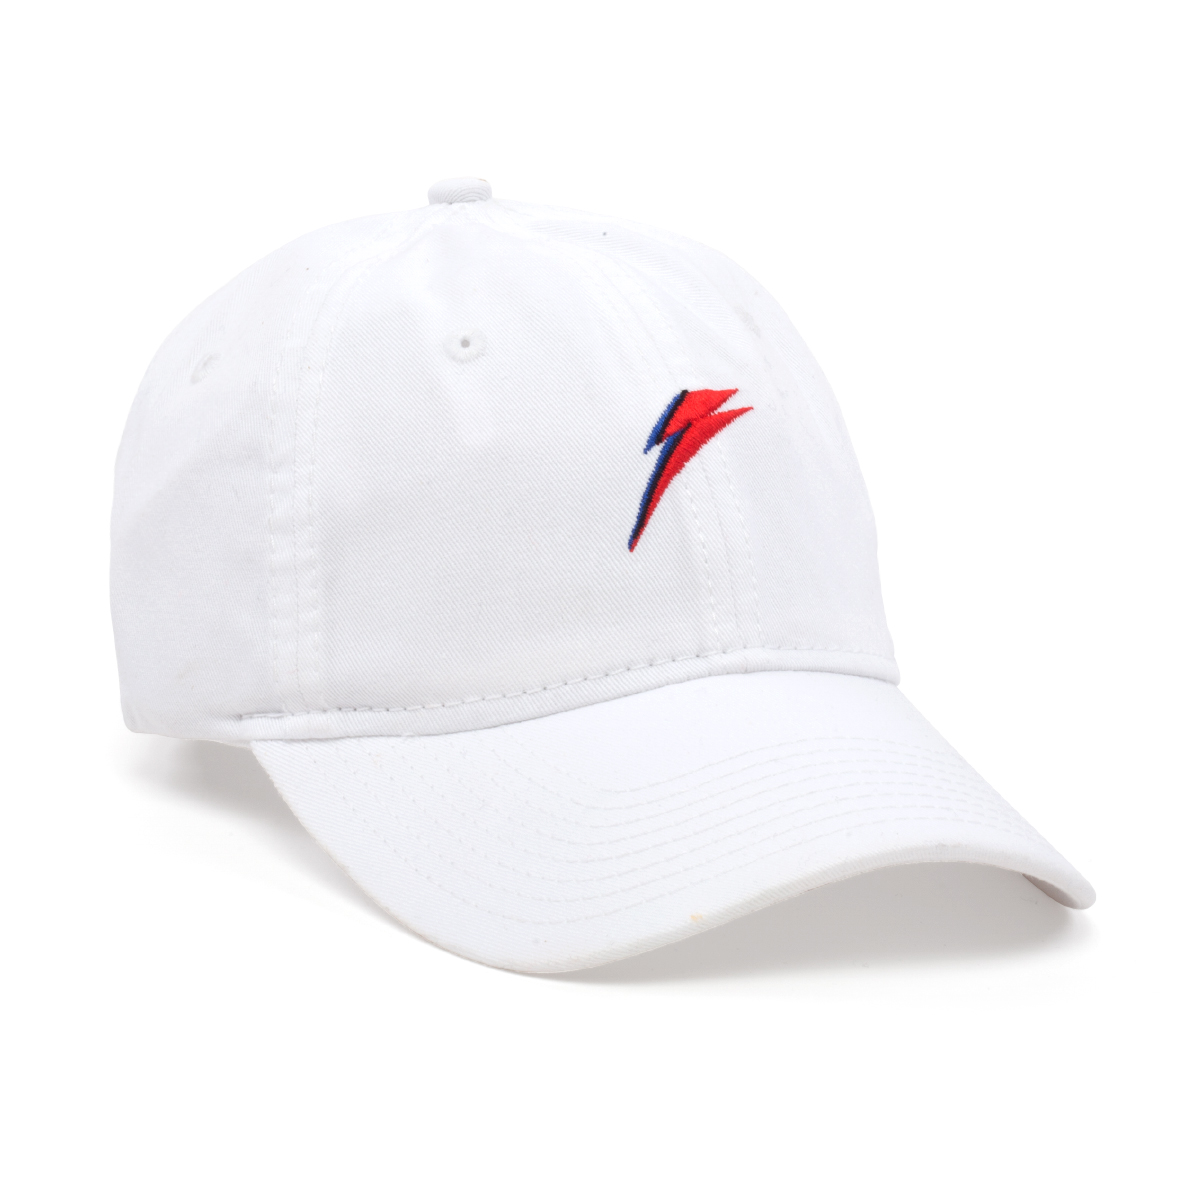 Bowie Lightning Bolt White Hat